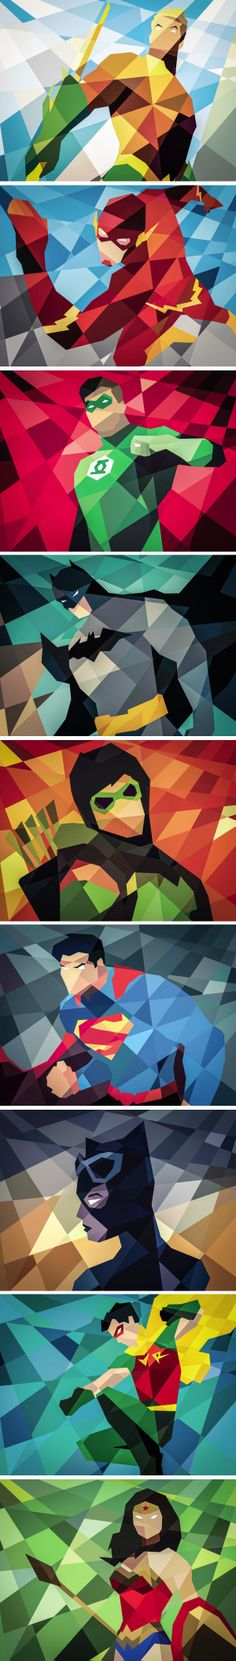 DC Comics goes Geometric, series by Eric Dufresne on Behance